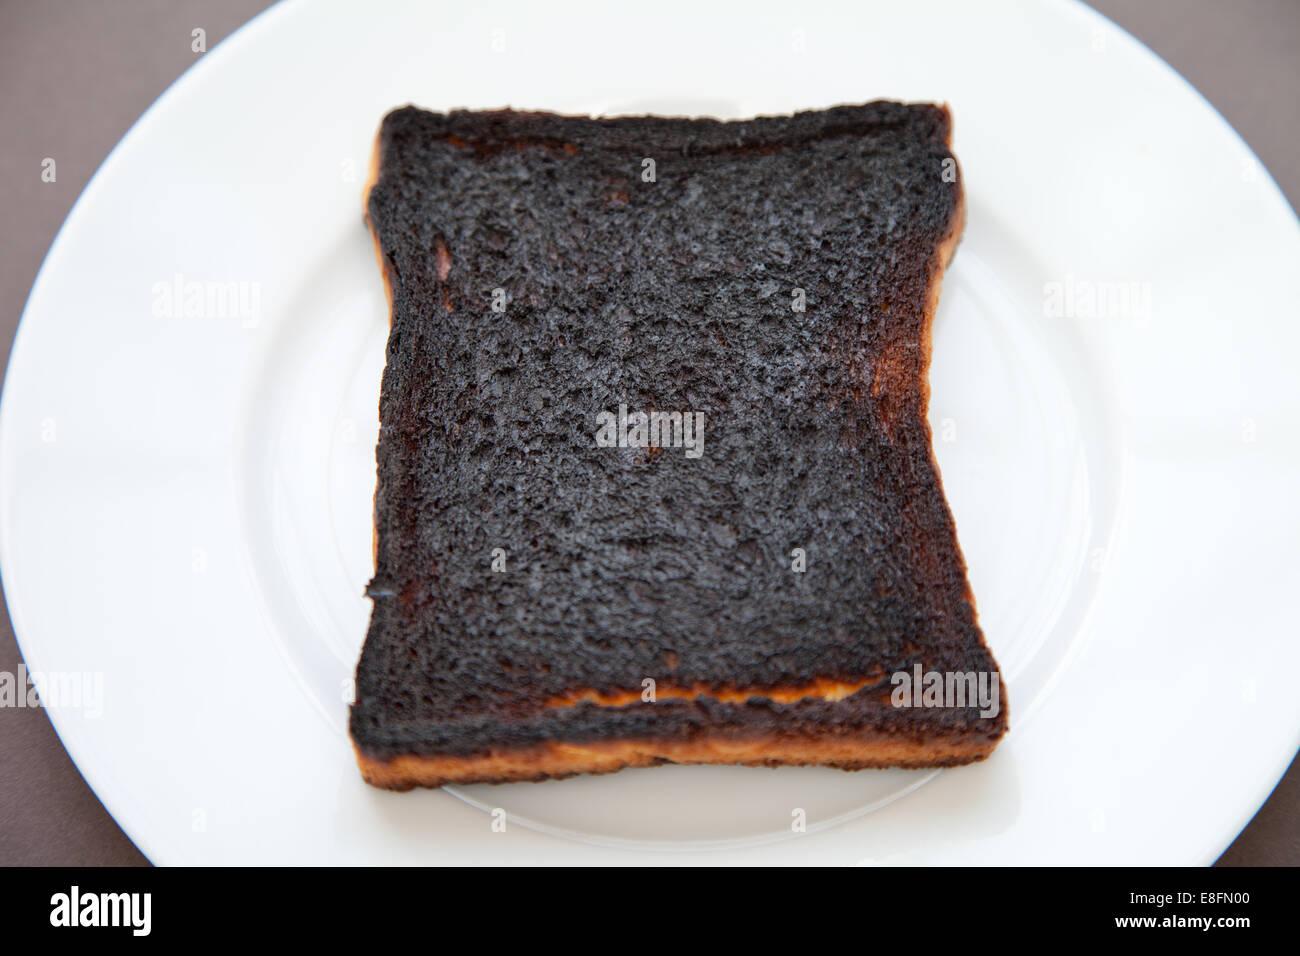 Slice of burnt toast on a plate - Stock Image